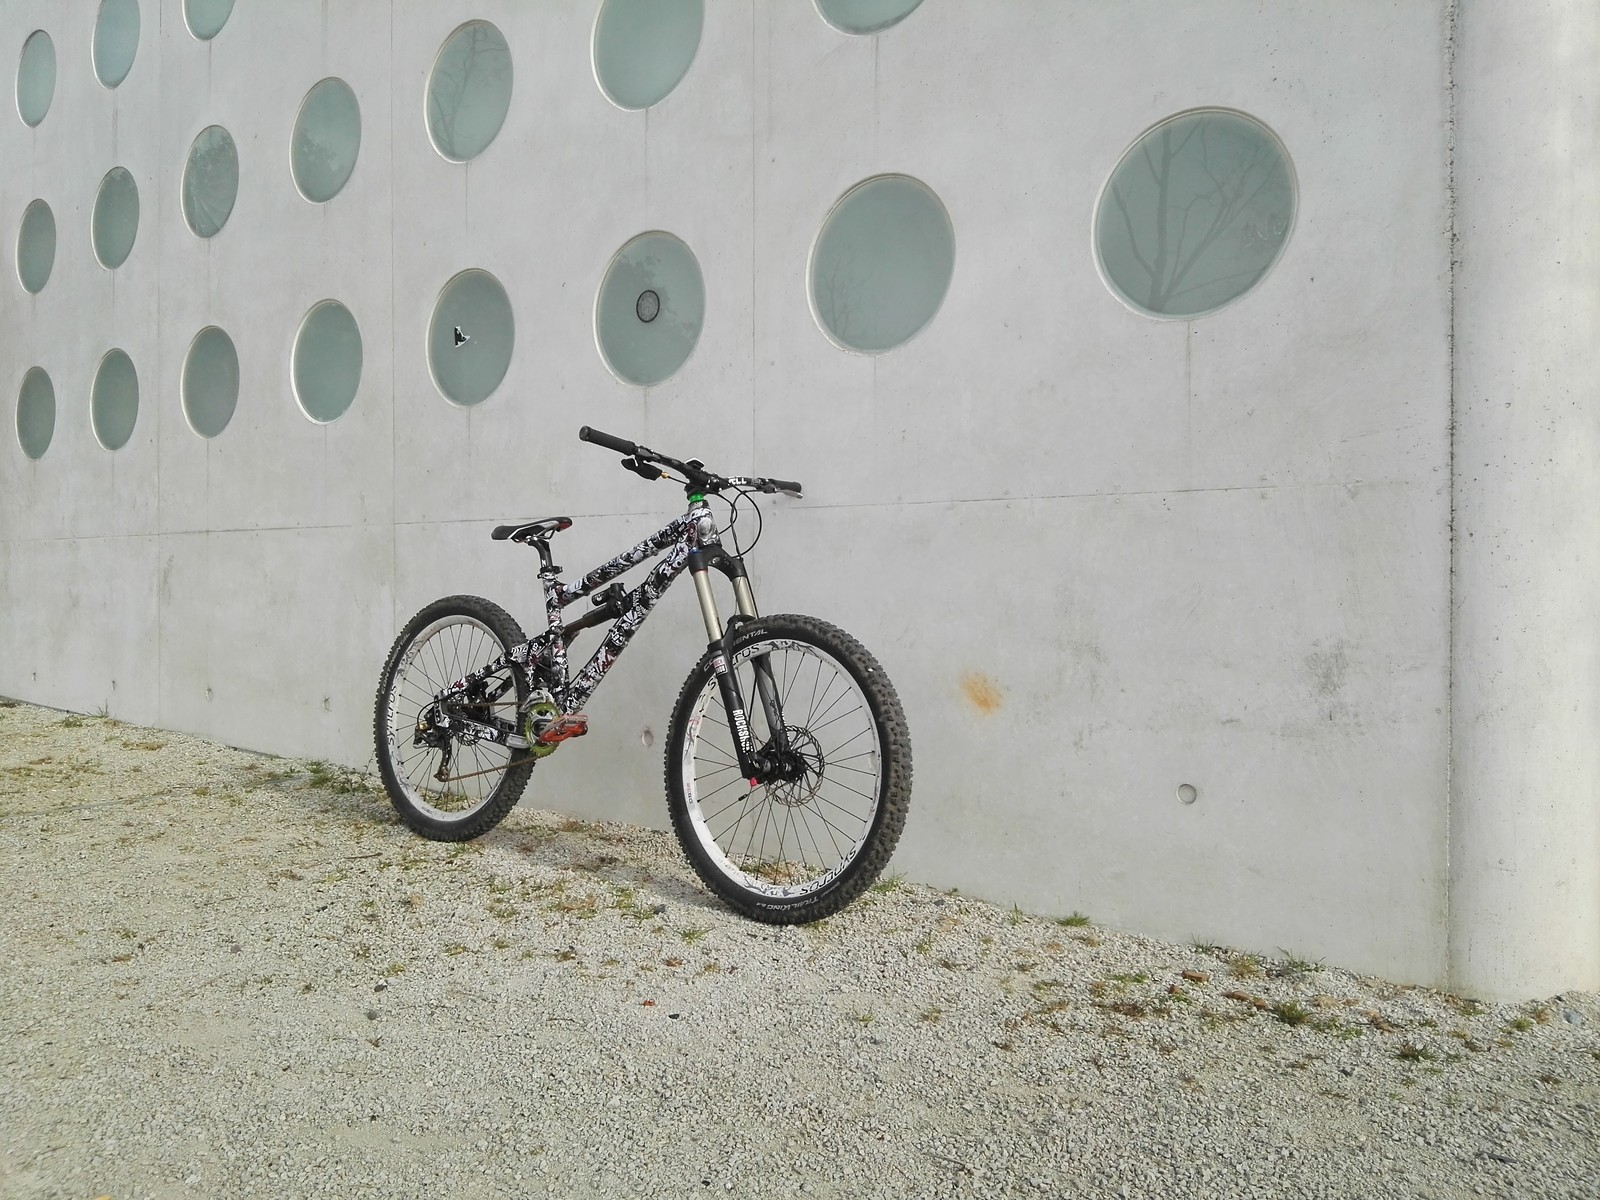 Wrap-o-bike